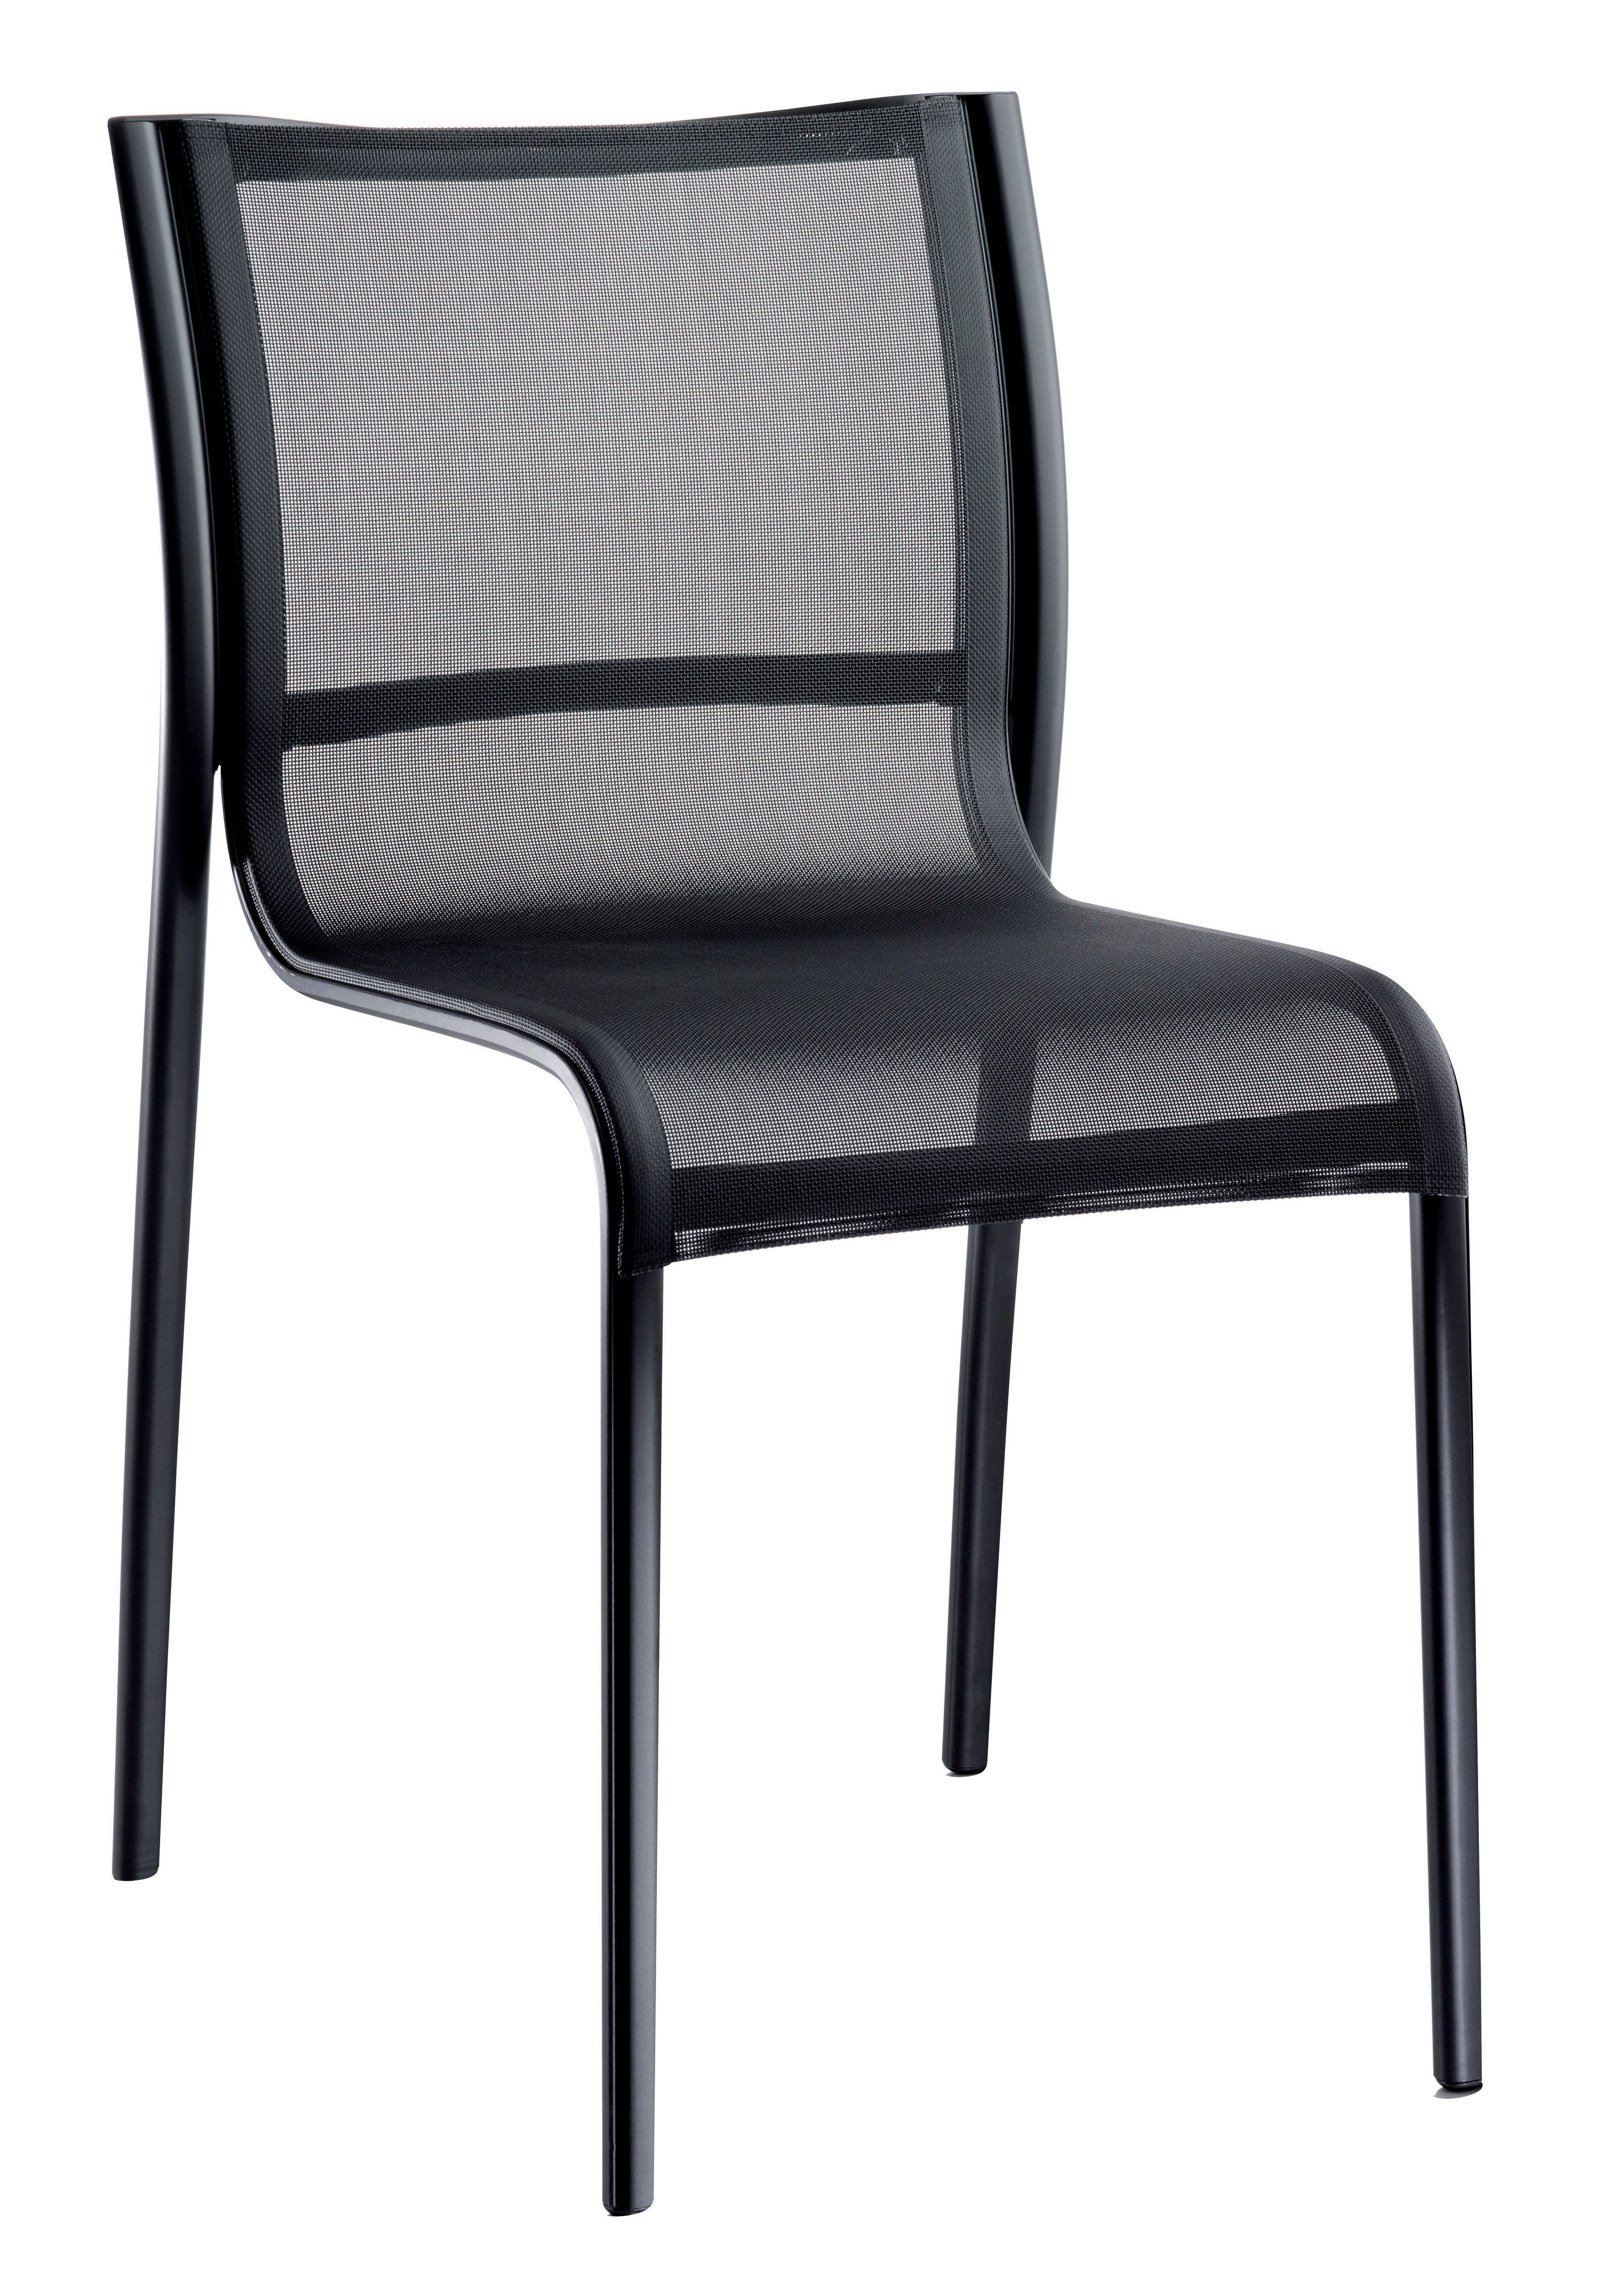 Paso doble magis stuhl for Stuhl magis